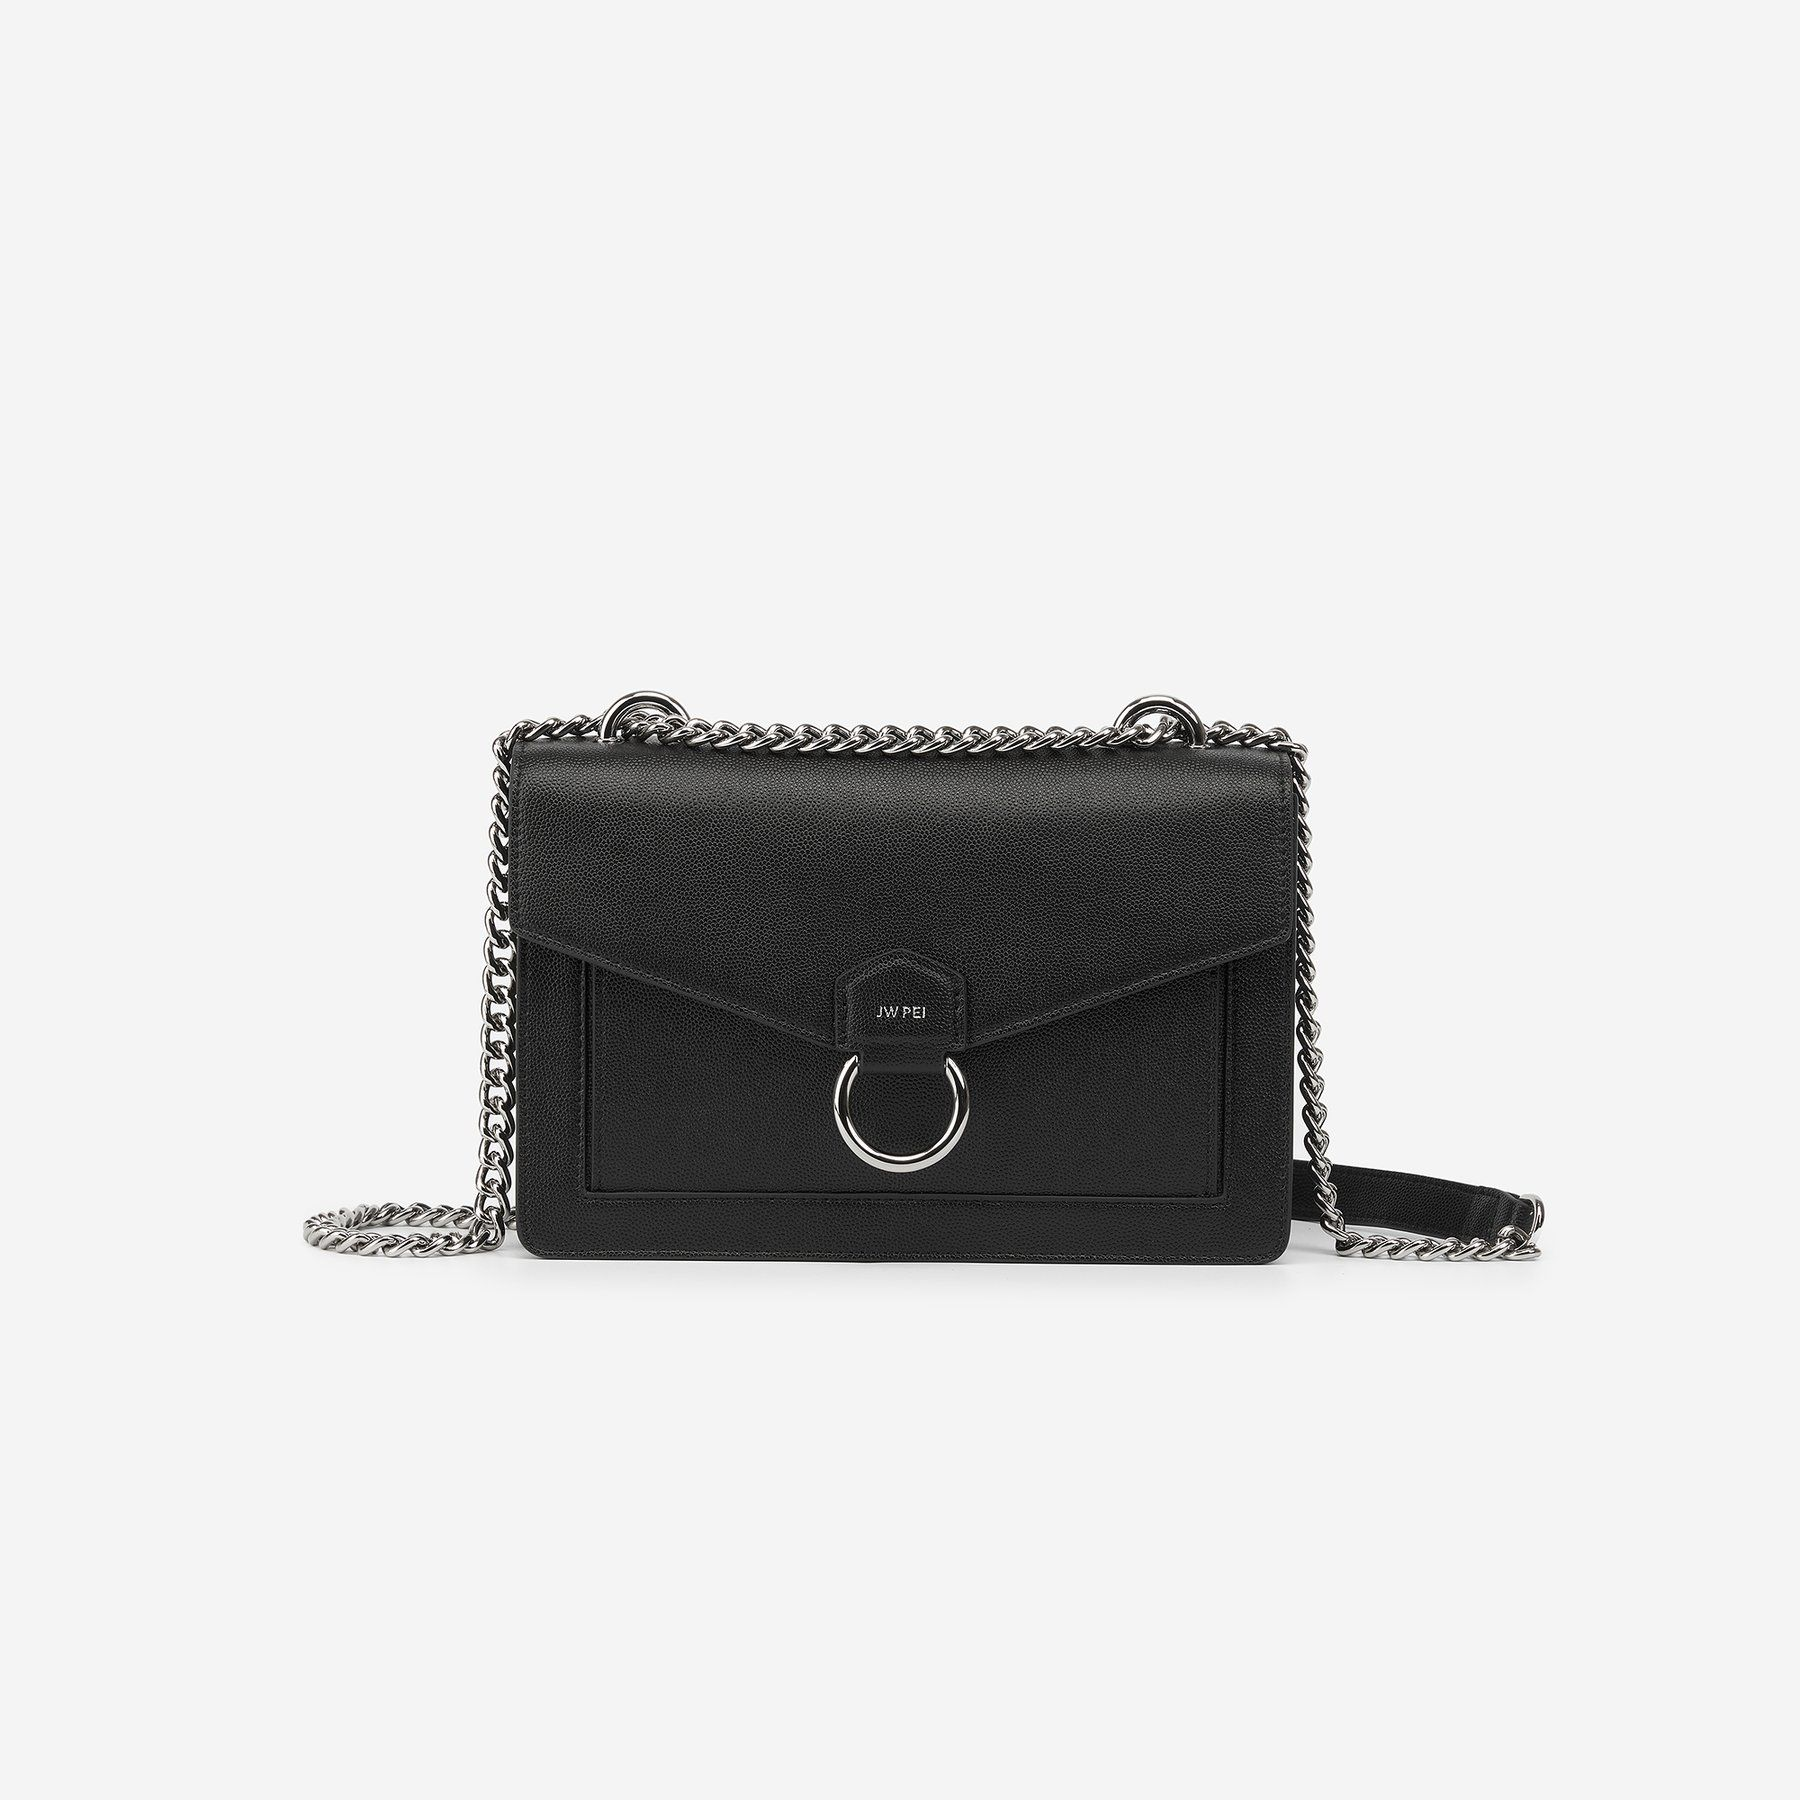 Purse Strap Replacement  Adjustable Microfiber Leather Cross body Bag Black